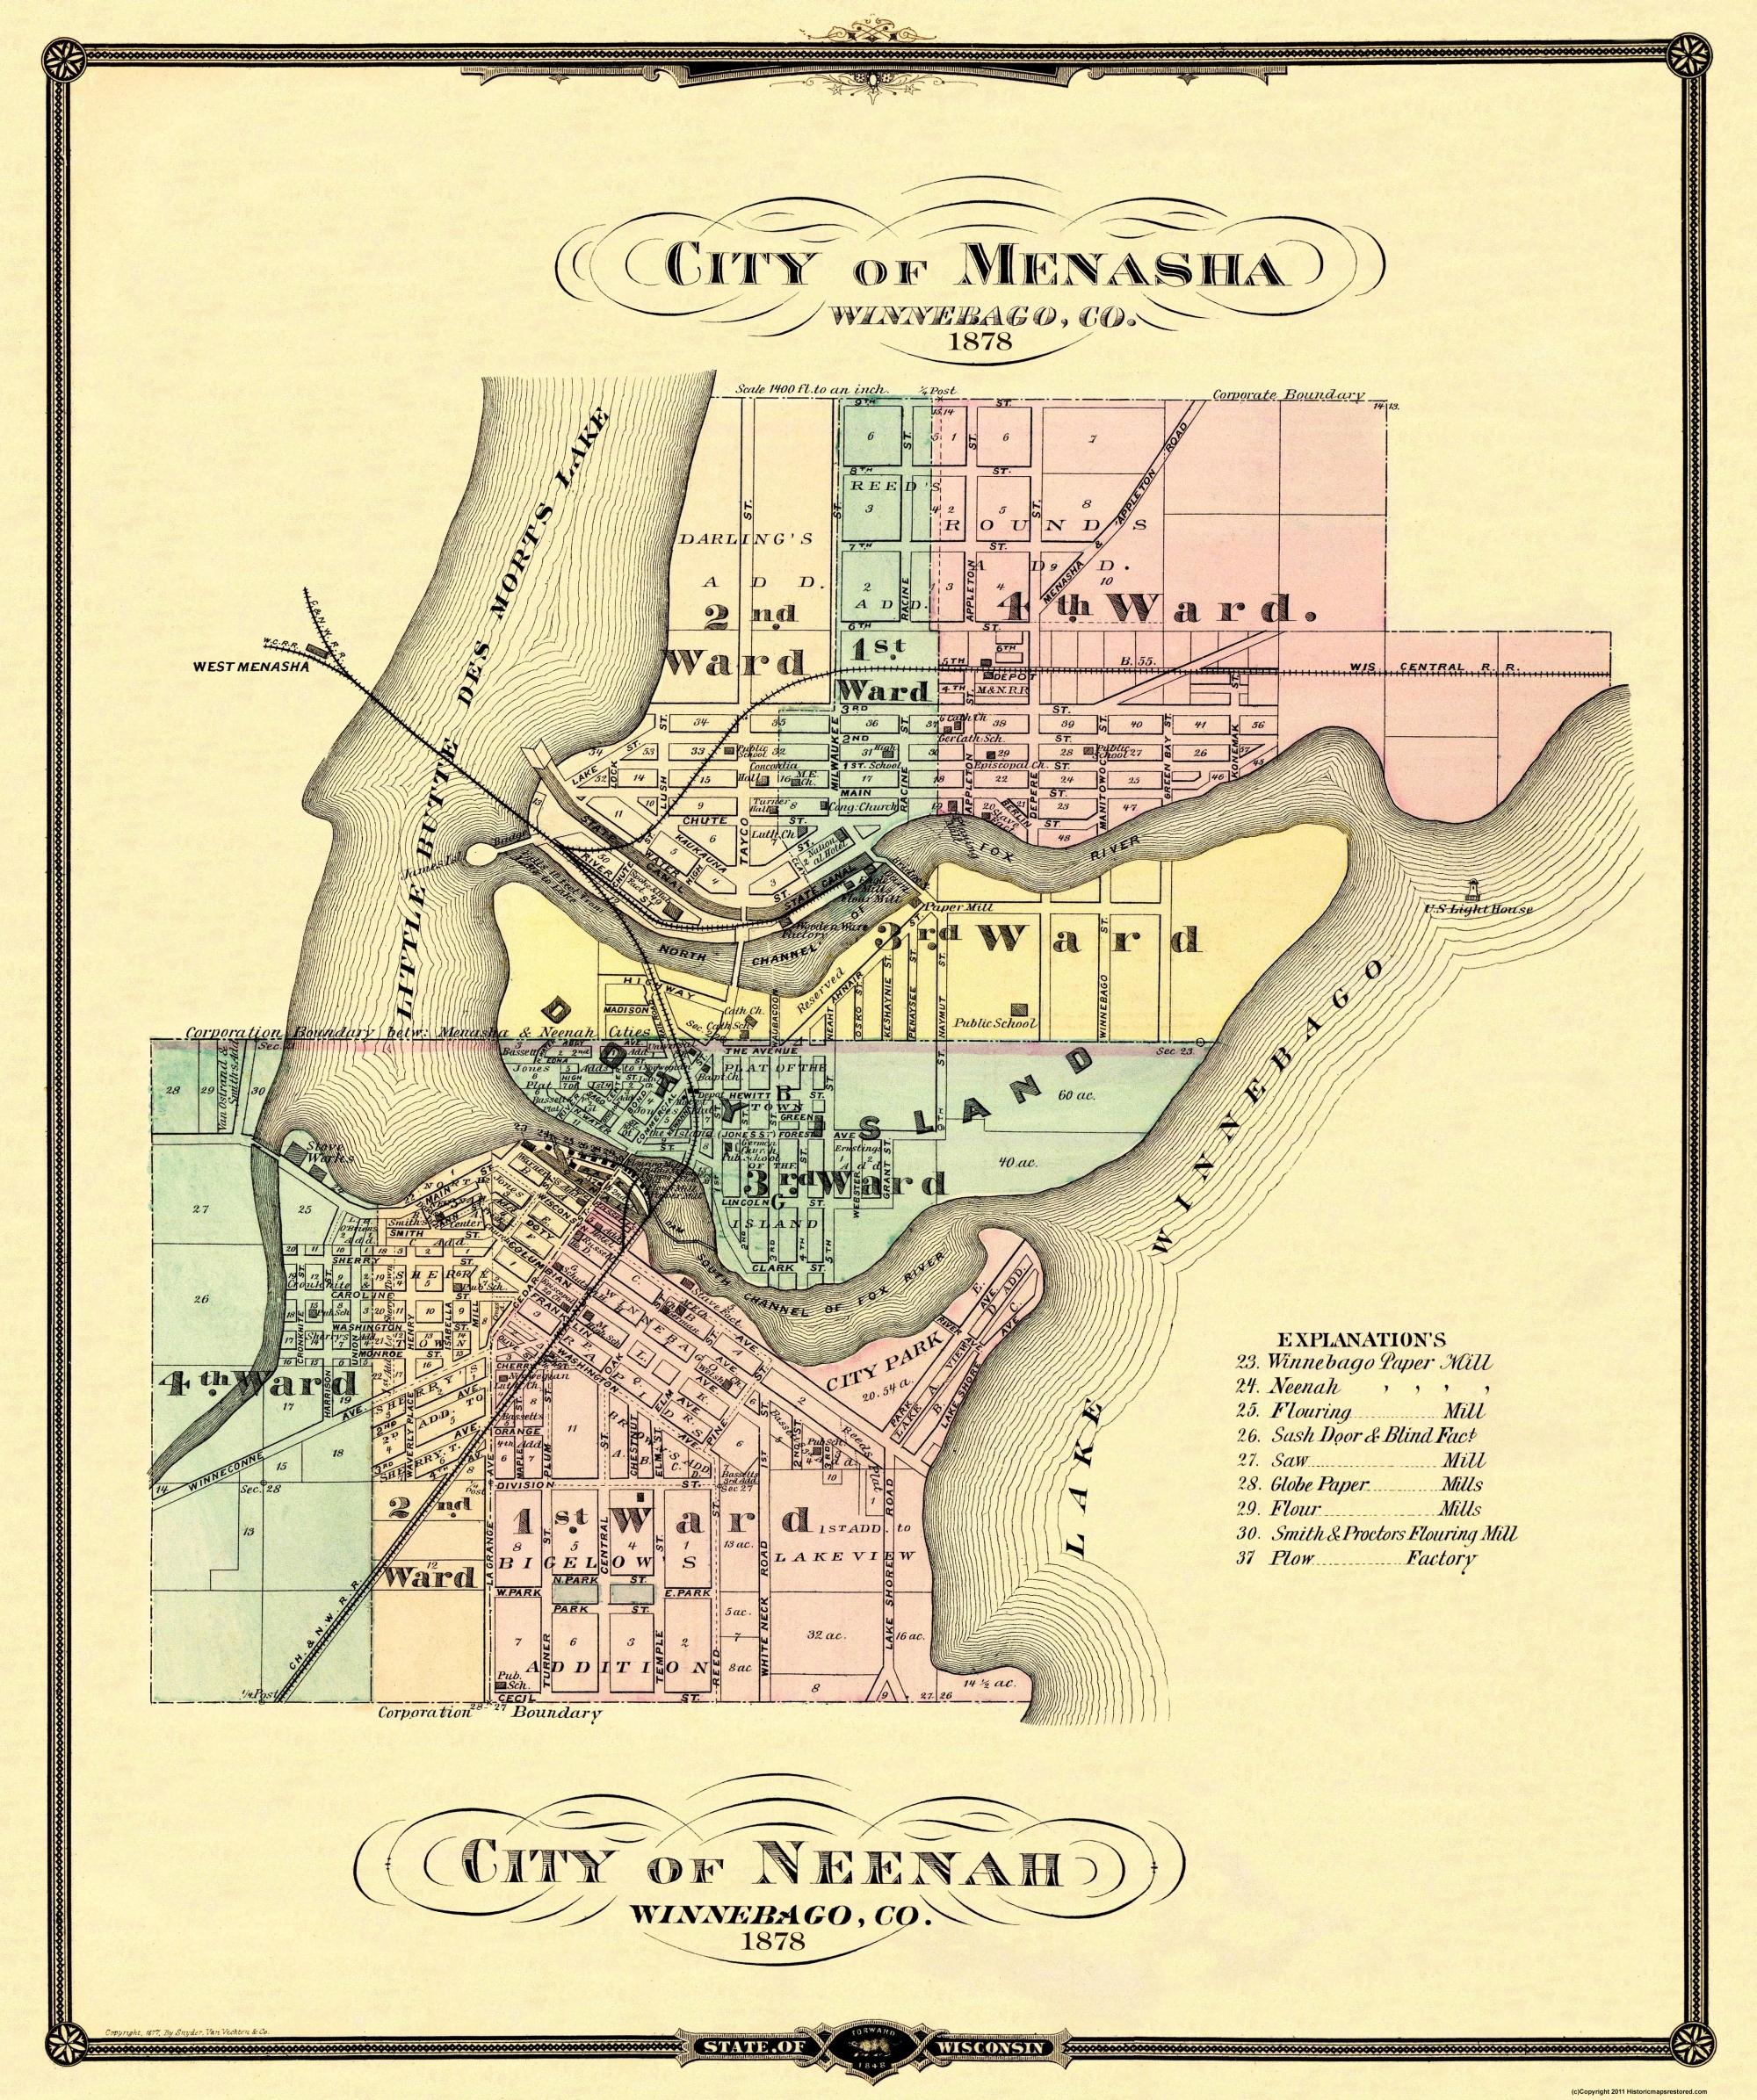 Old City Map Menasha Neenah Wisconsin 1878